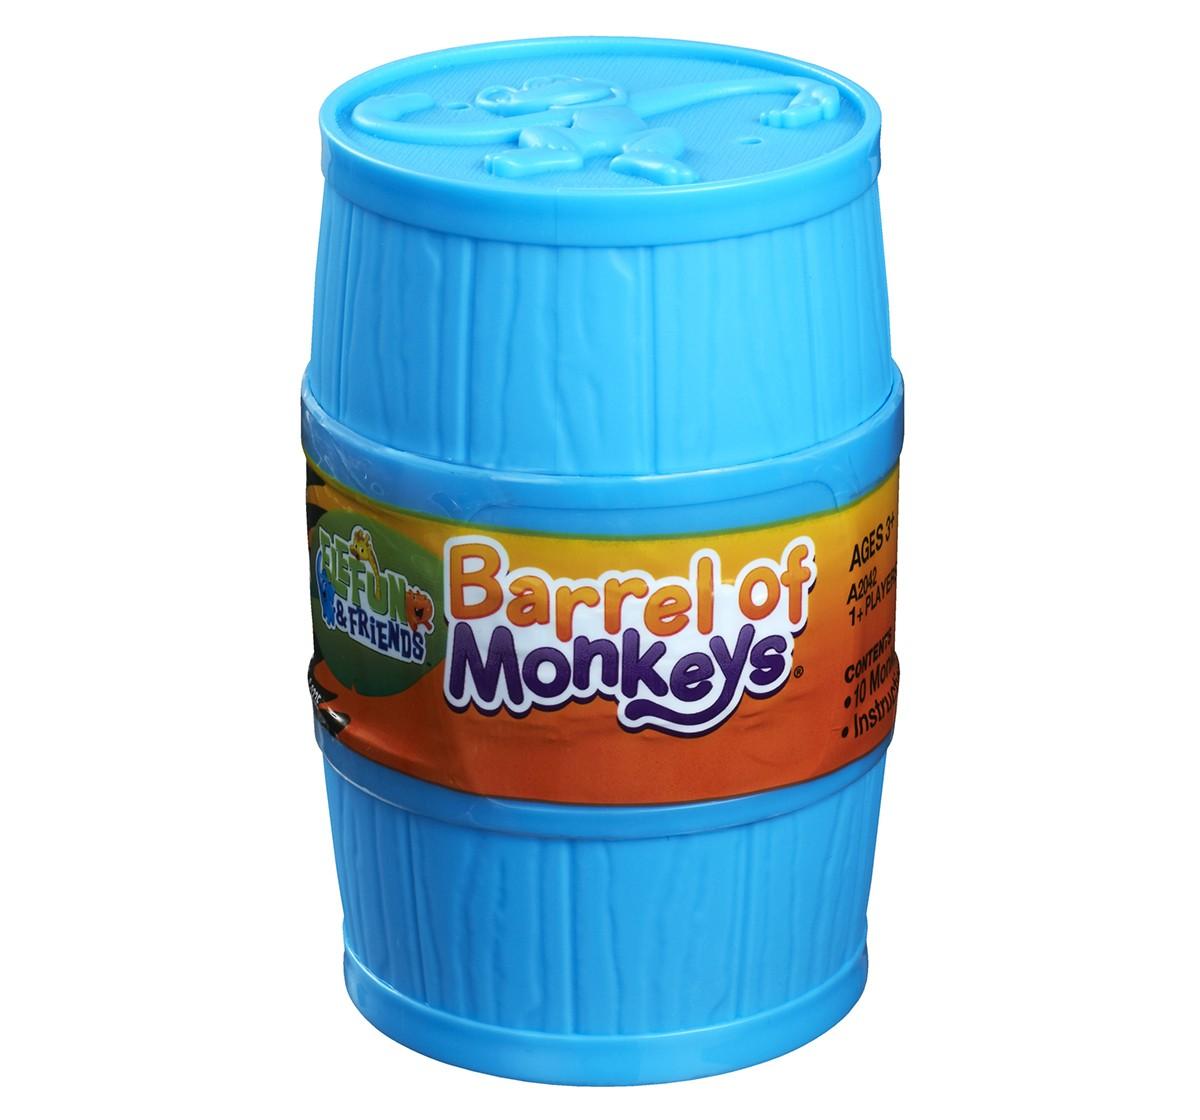 Hasbro Barrel Of Monkeys Game for Kids age 3Y+